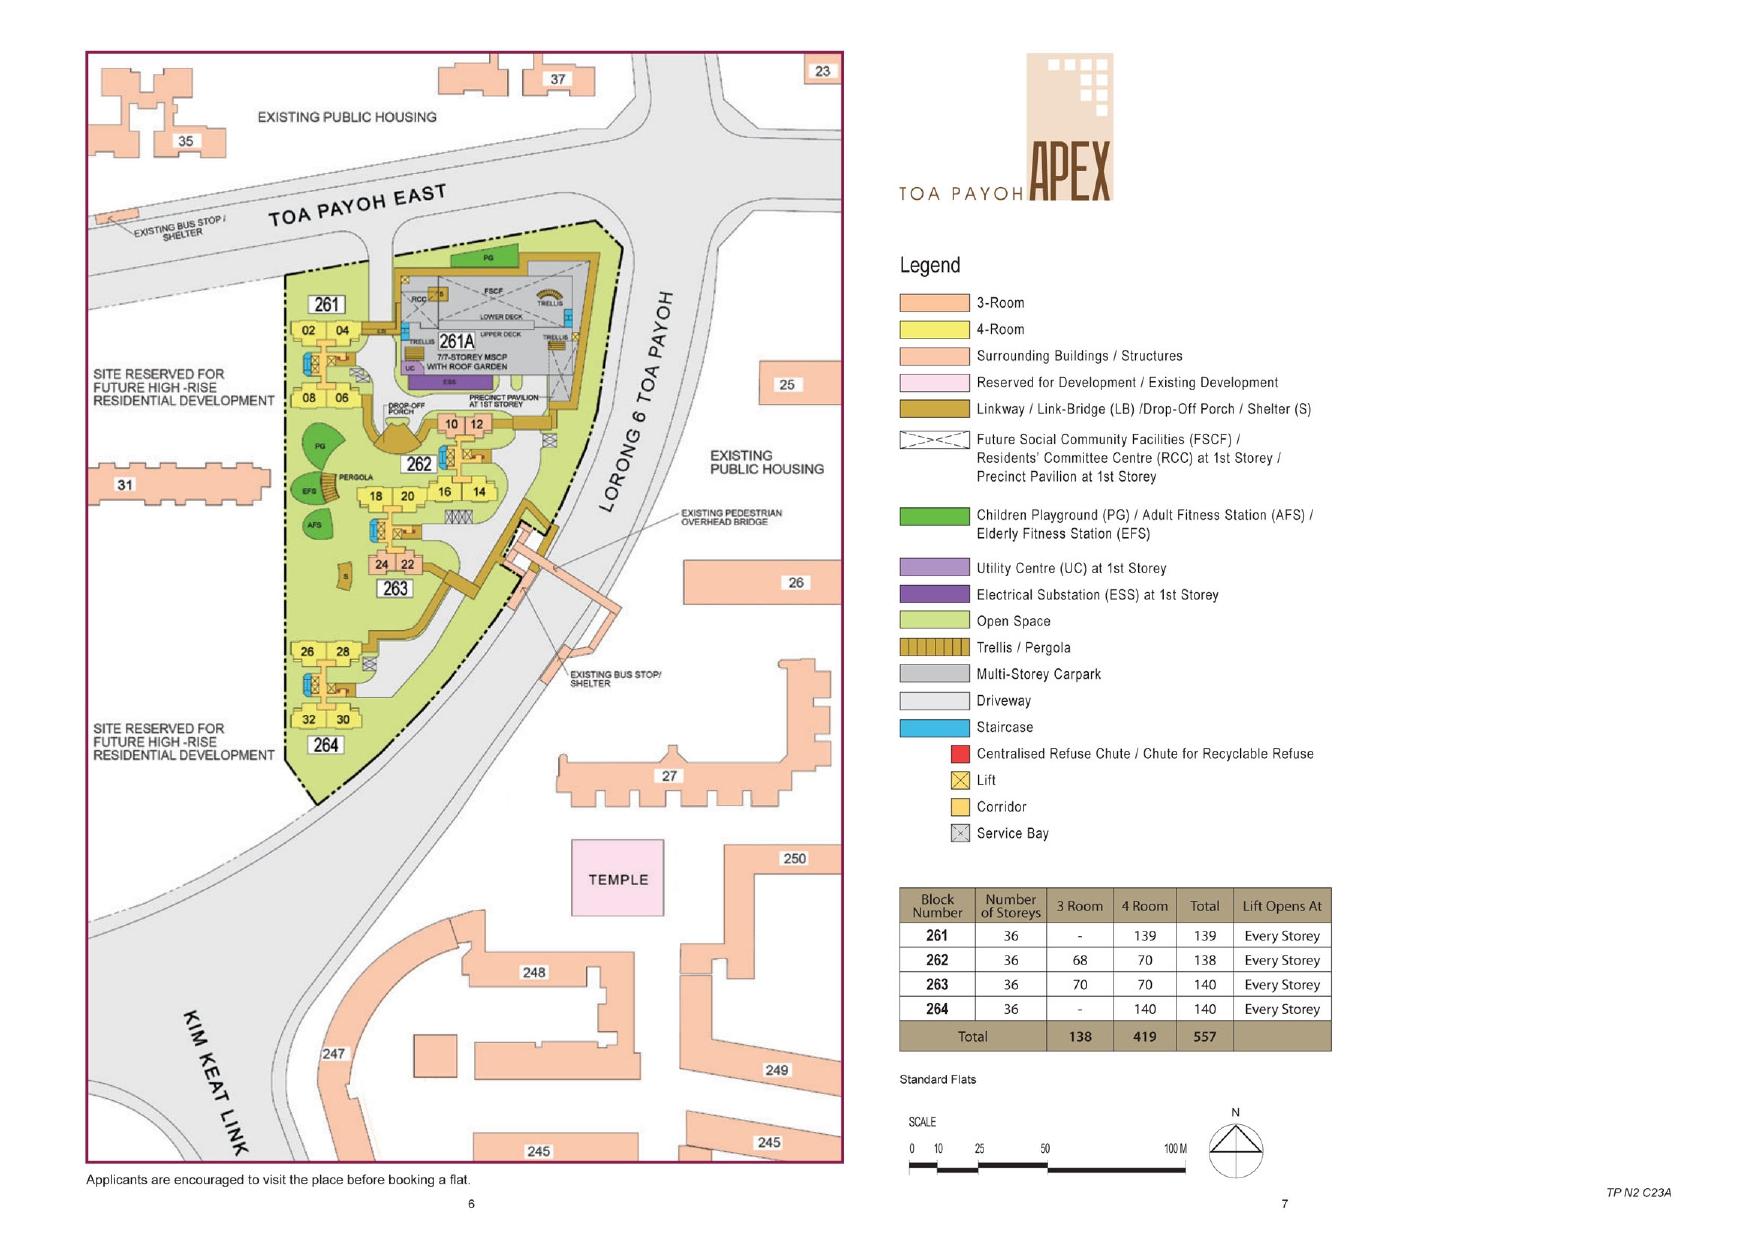 Toa Payoh Apex Site Plan